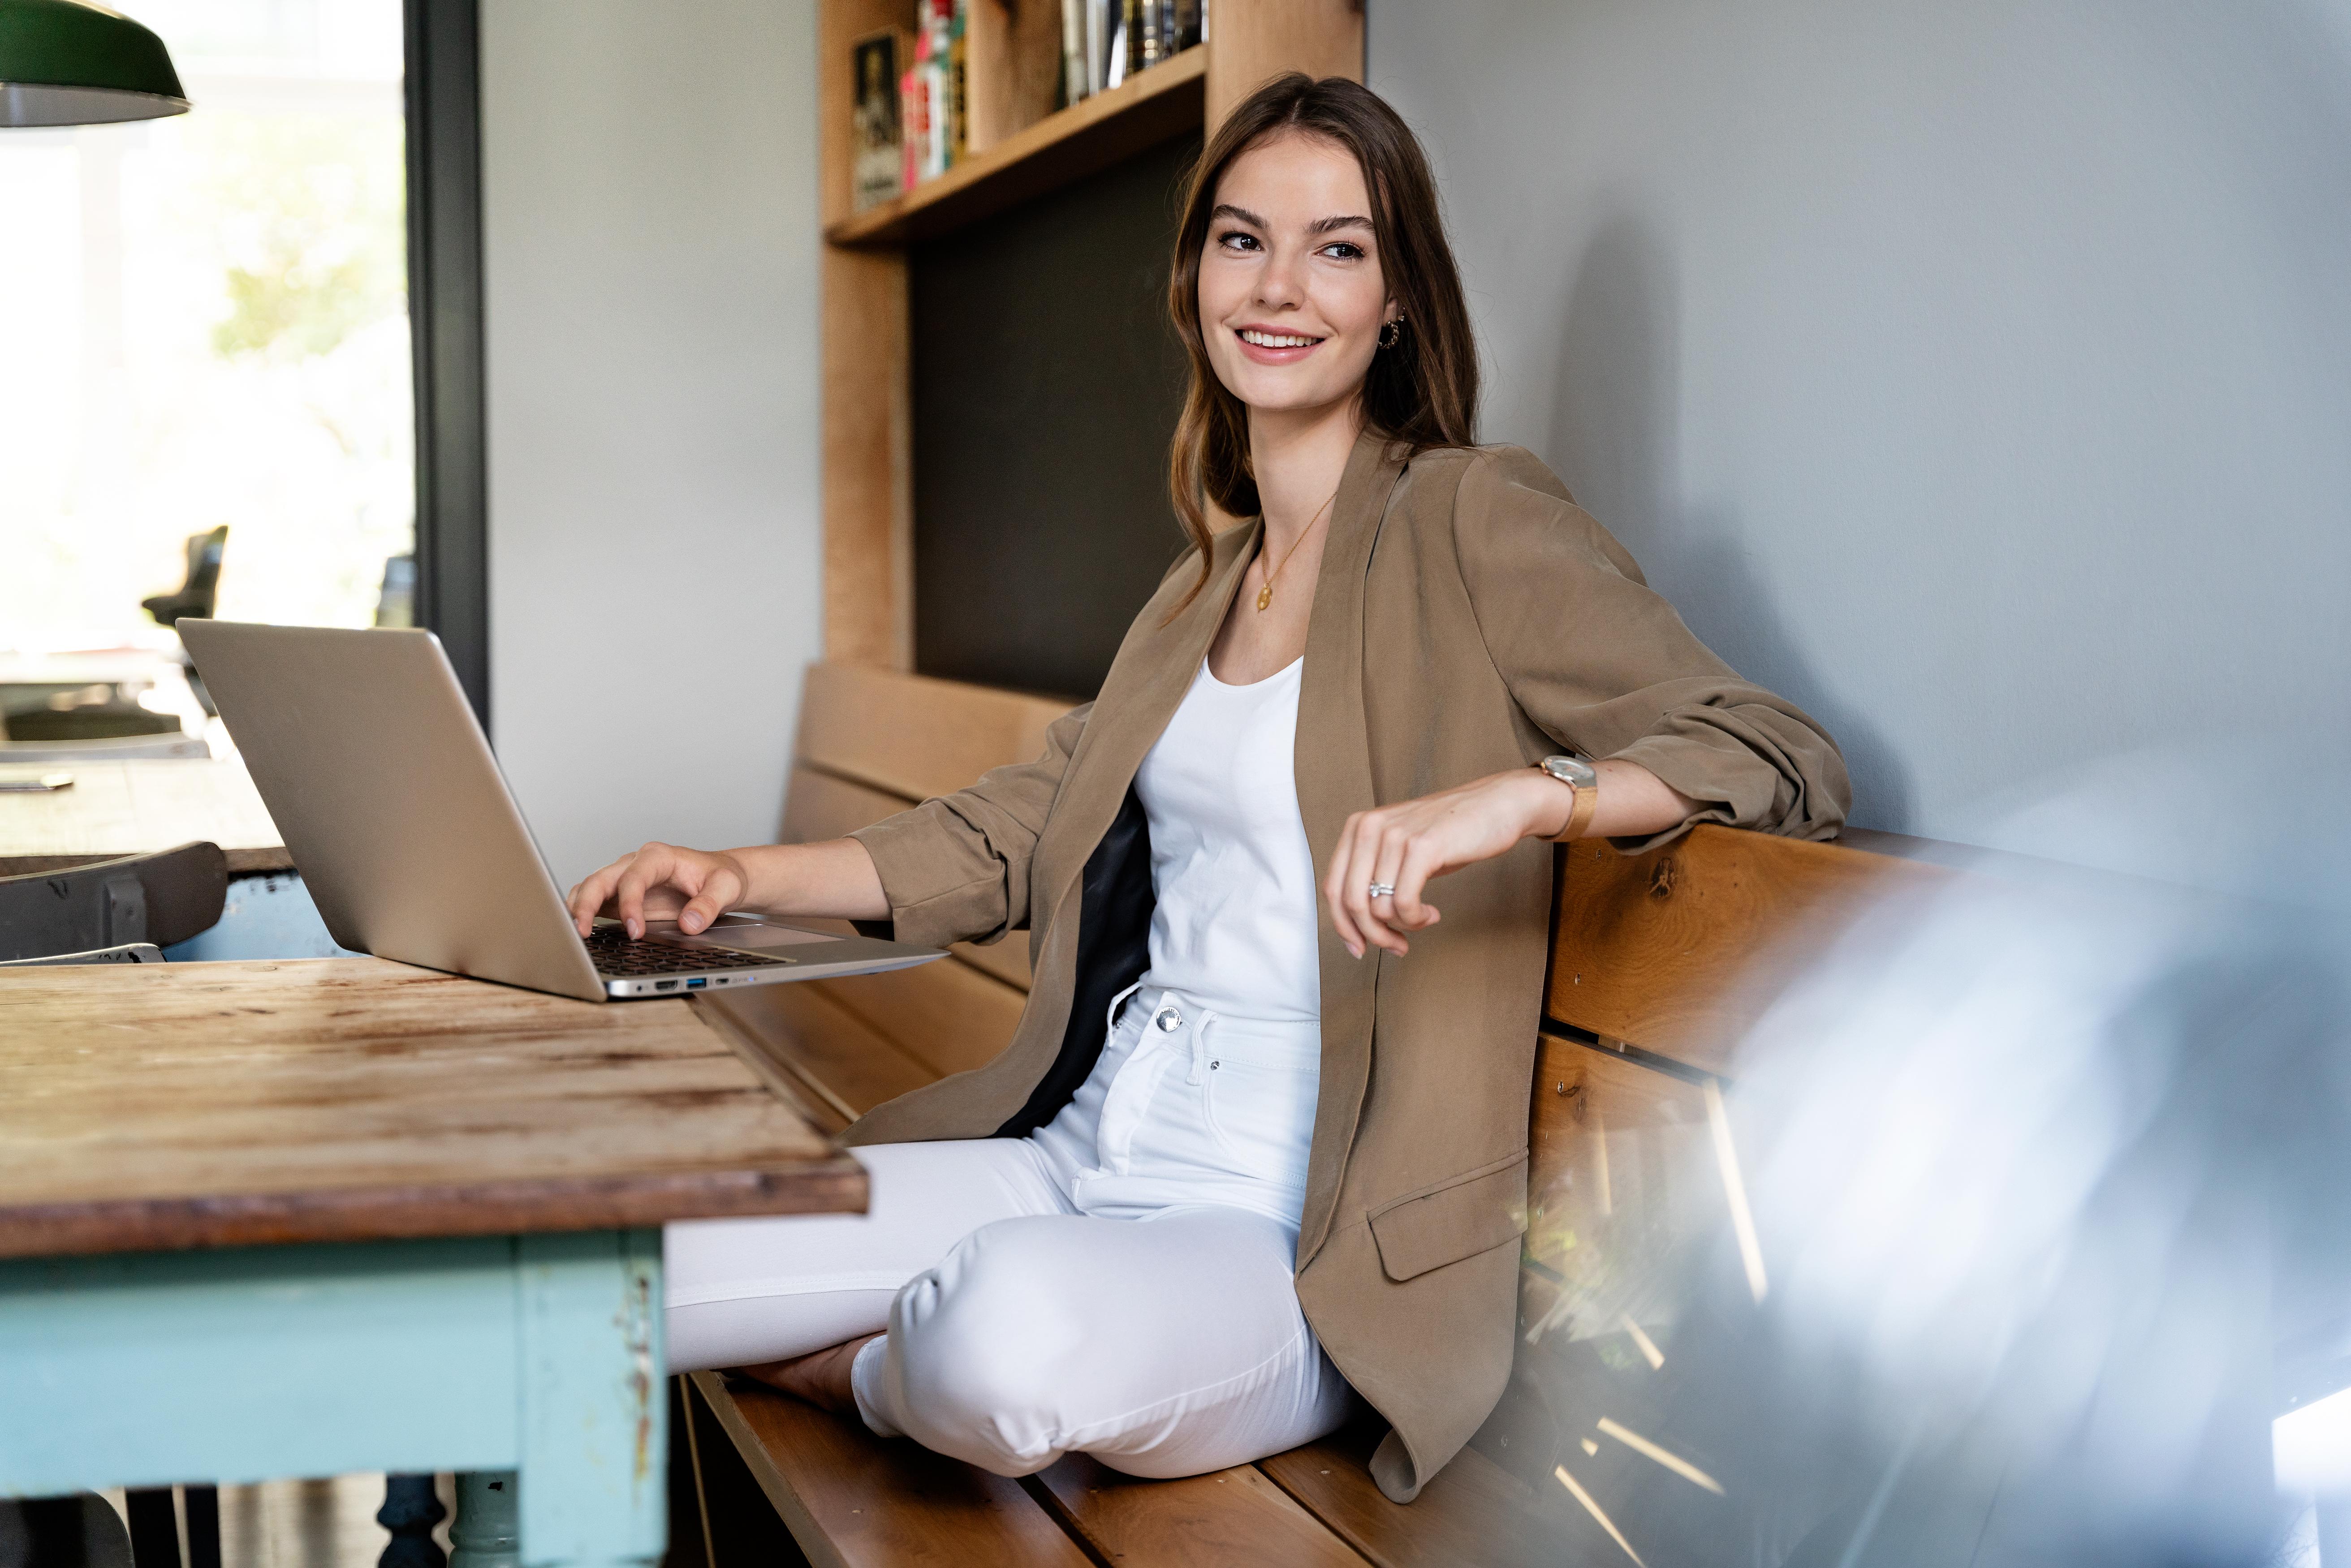 junge Frau mit natürlichem Styling in legerer Business Situation